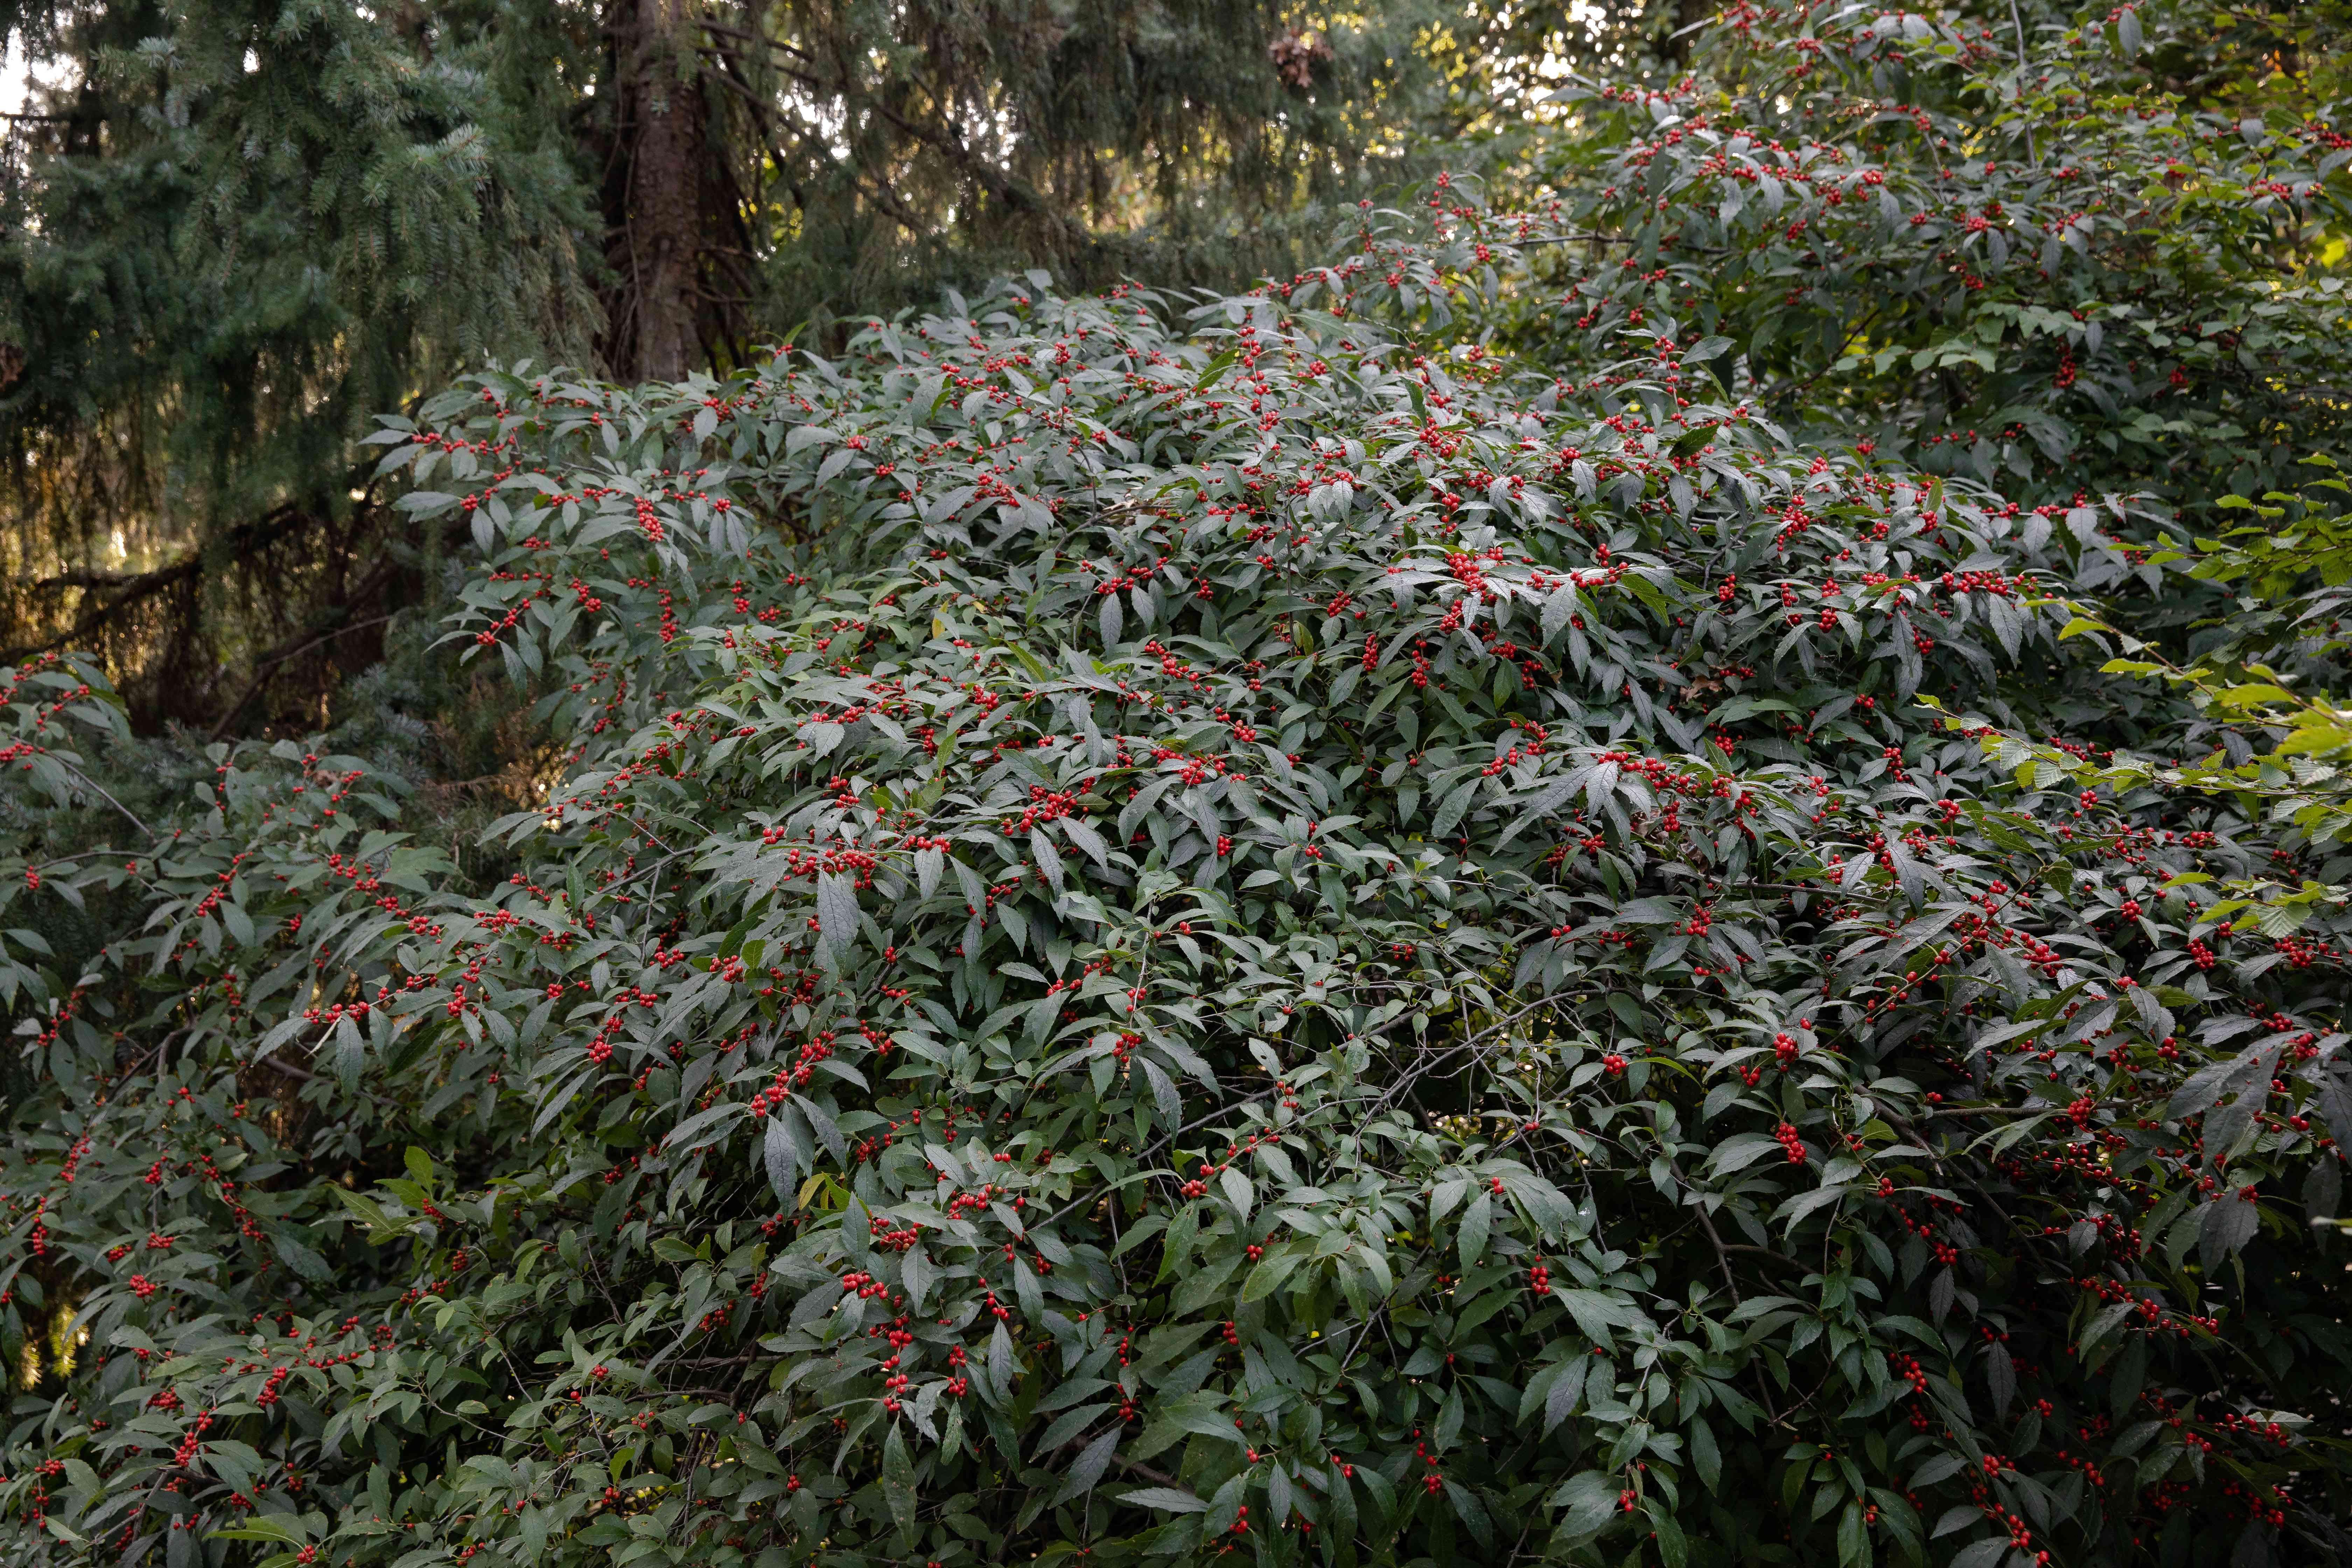 winterberry holly shrub